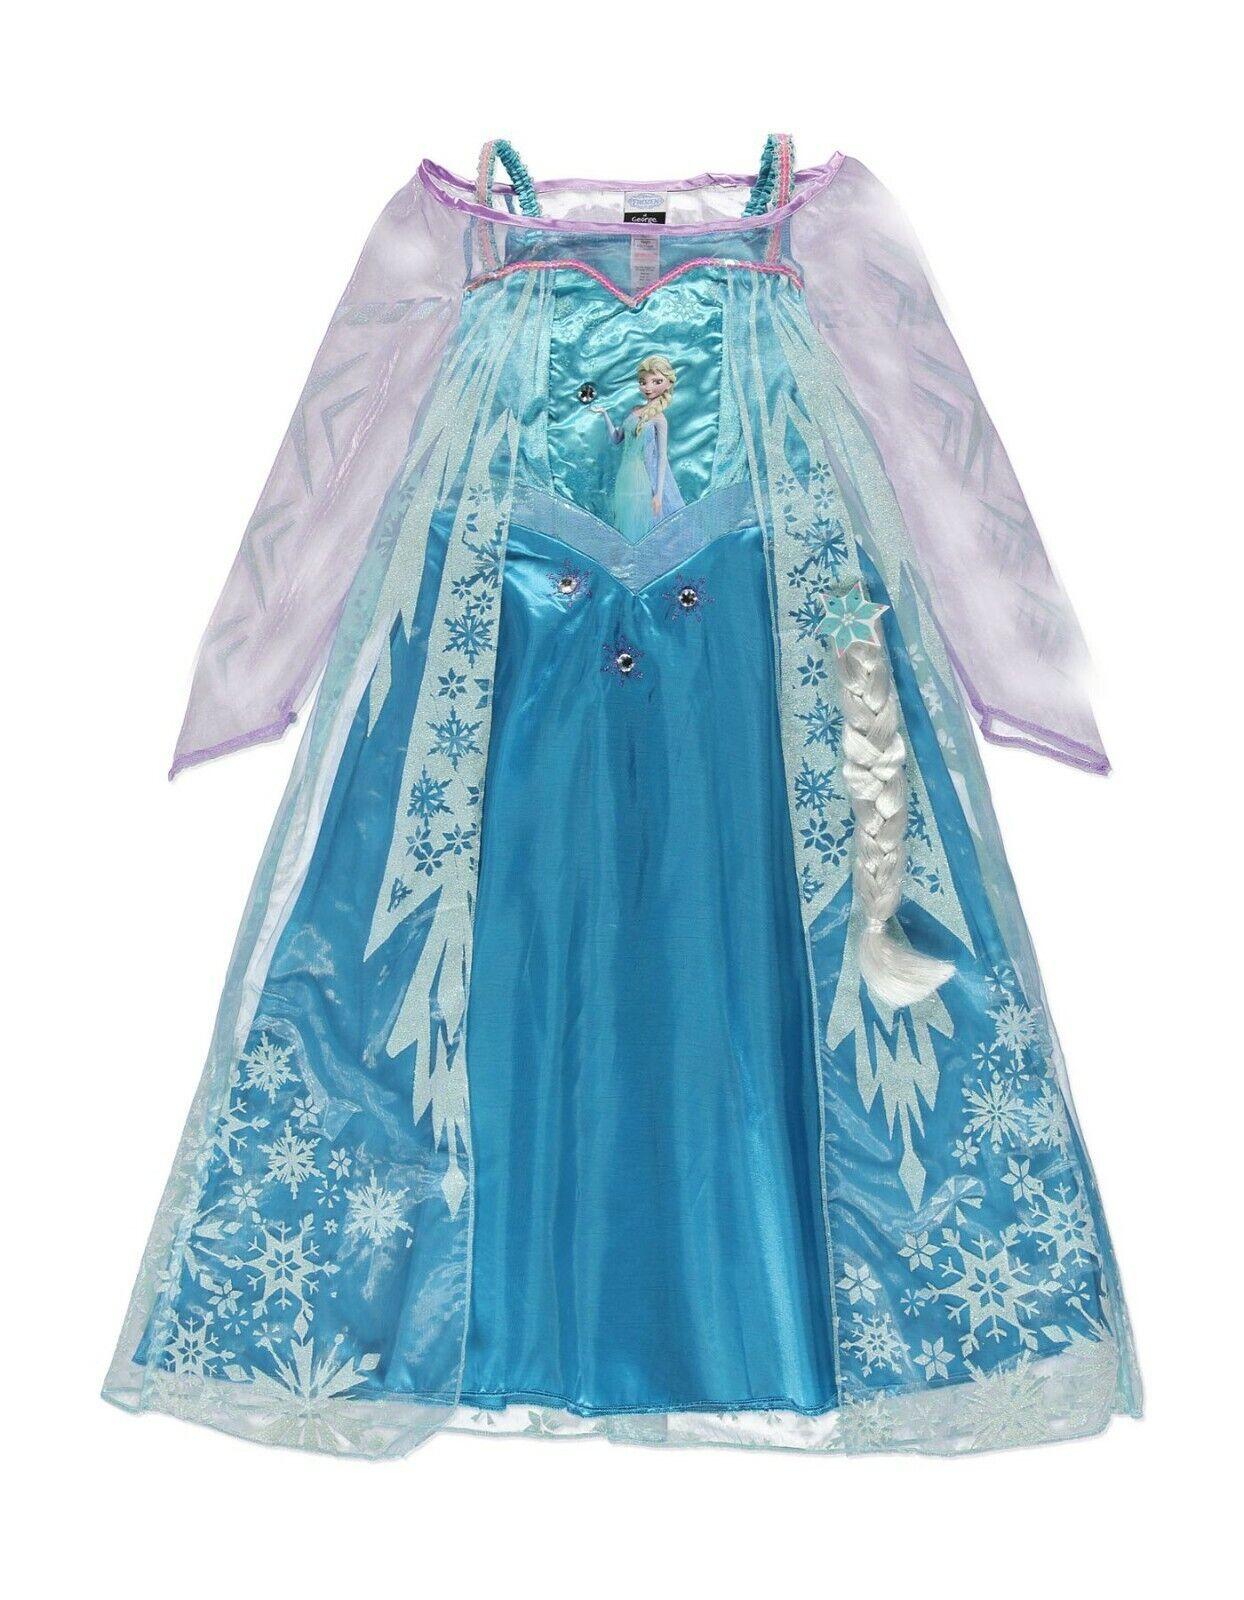 Disney George Frozen Elsa Costume Age 5-6